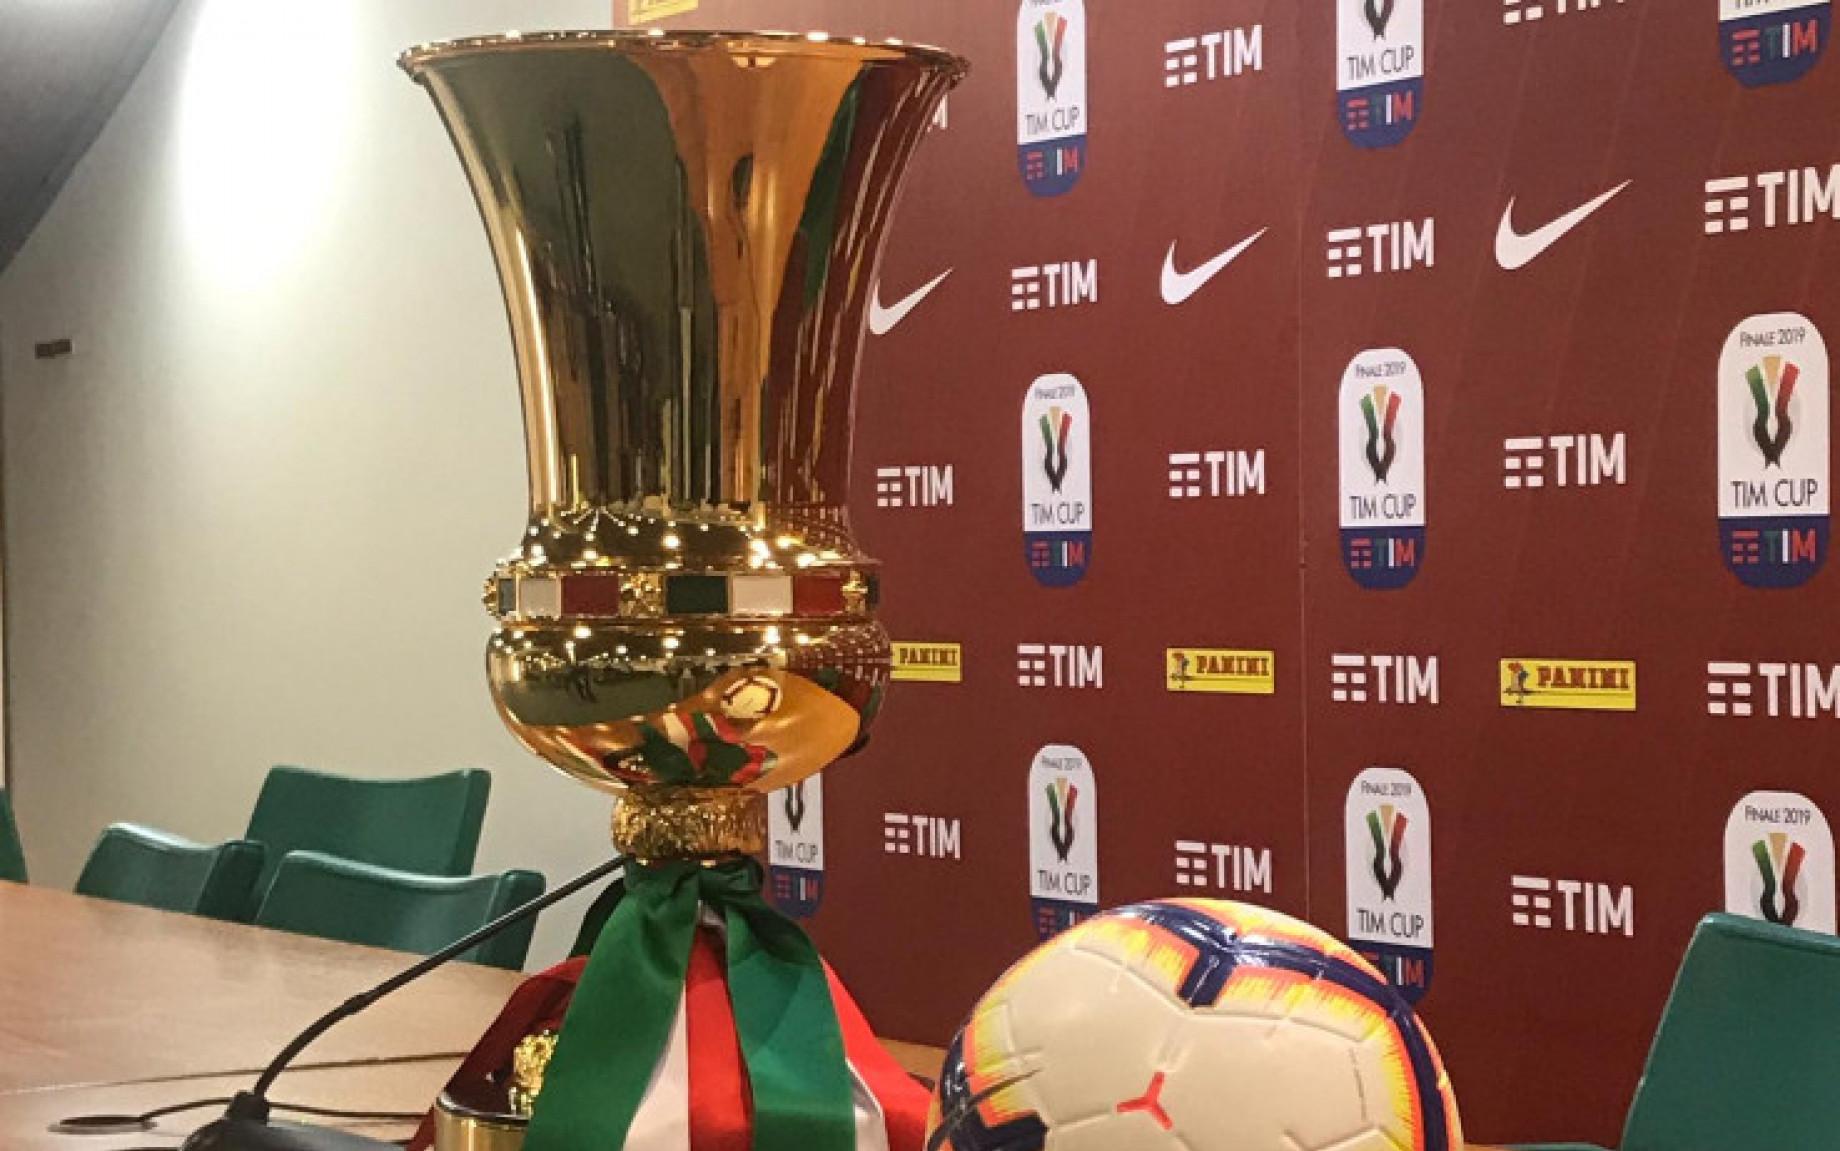 coppa_italia_trofeo_tim_cup_gdm.jpg